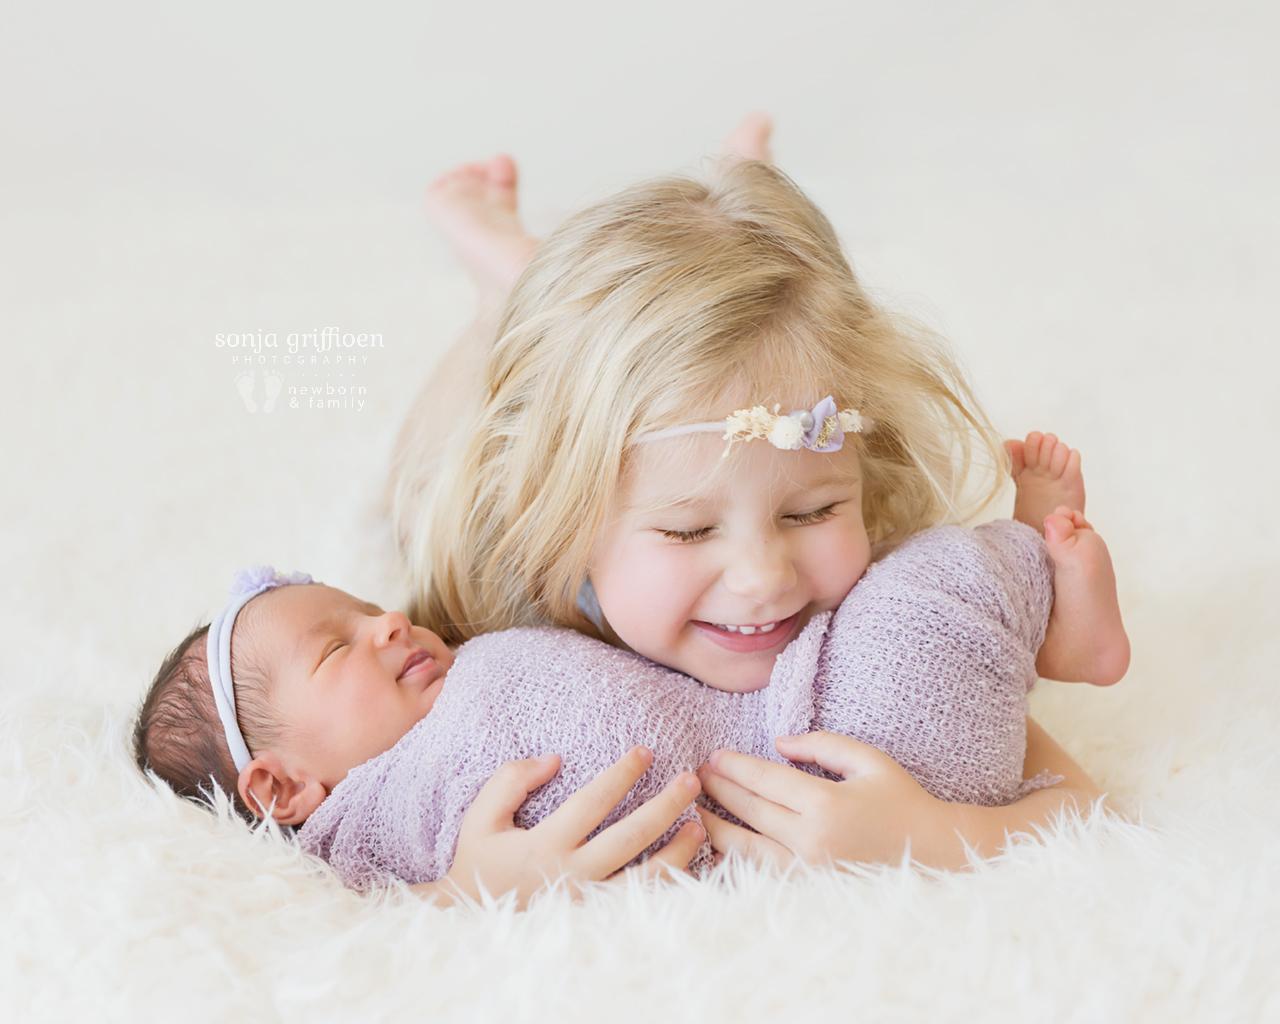 Maple-Rose-Newborn-Brisbane-Newborn-Photographer-Sonja-Griffioen-07.jpg